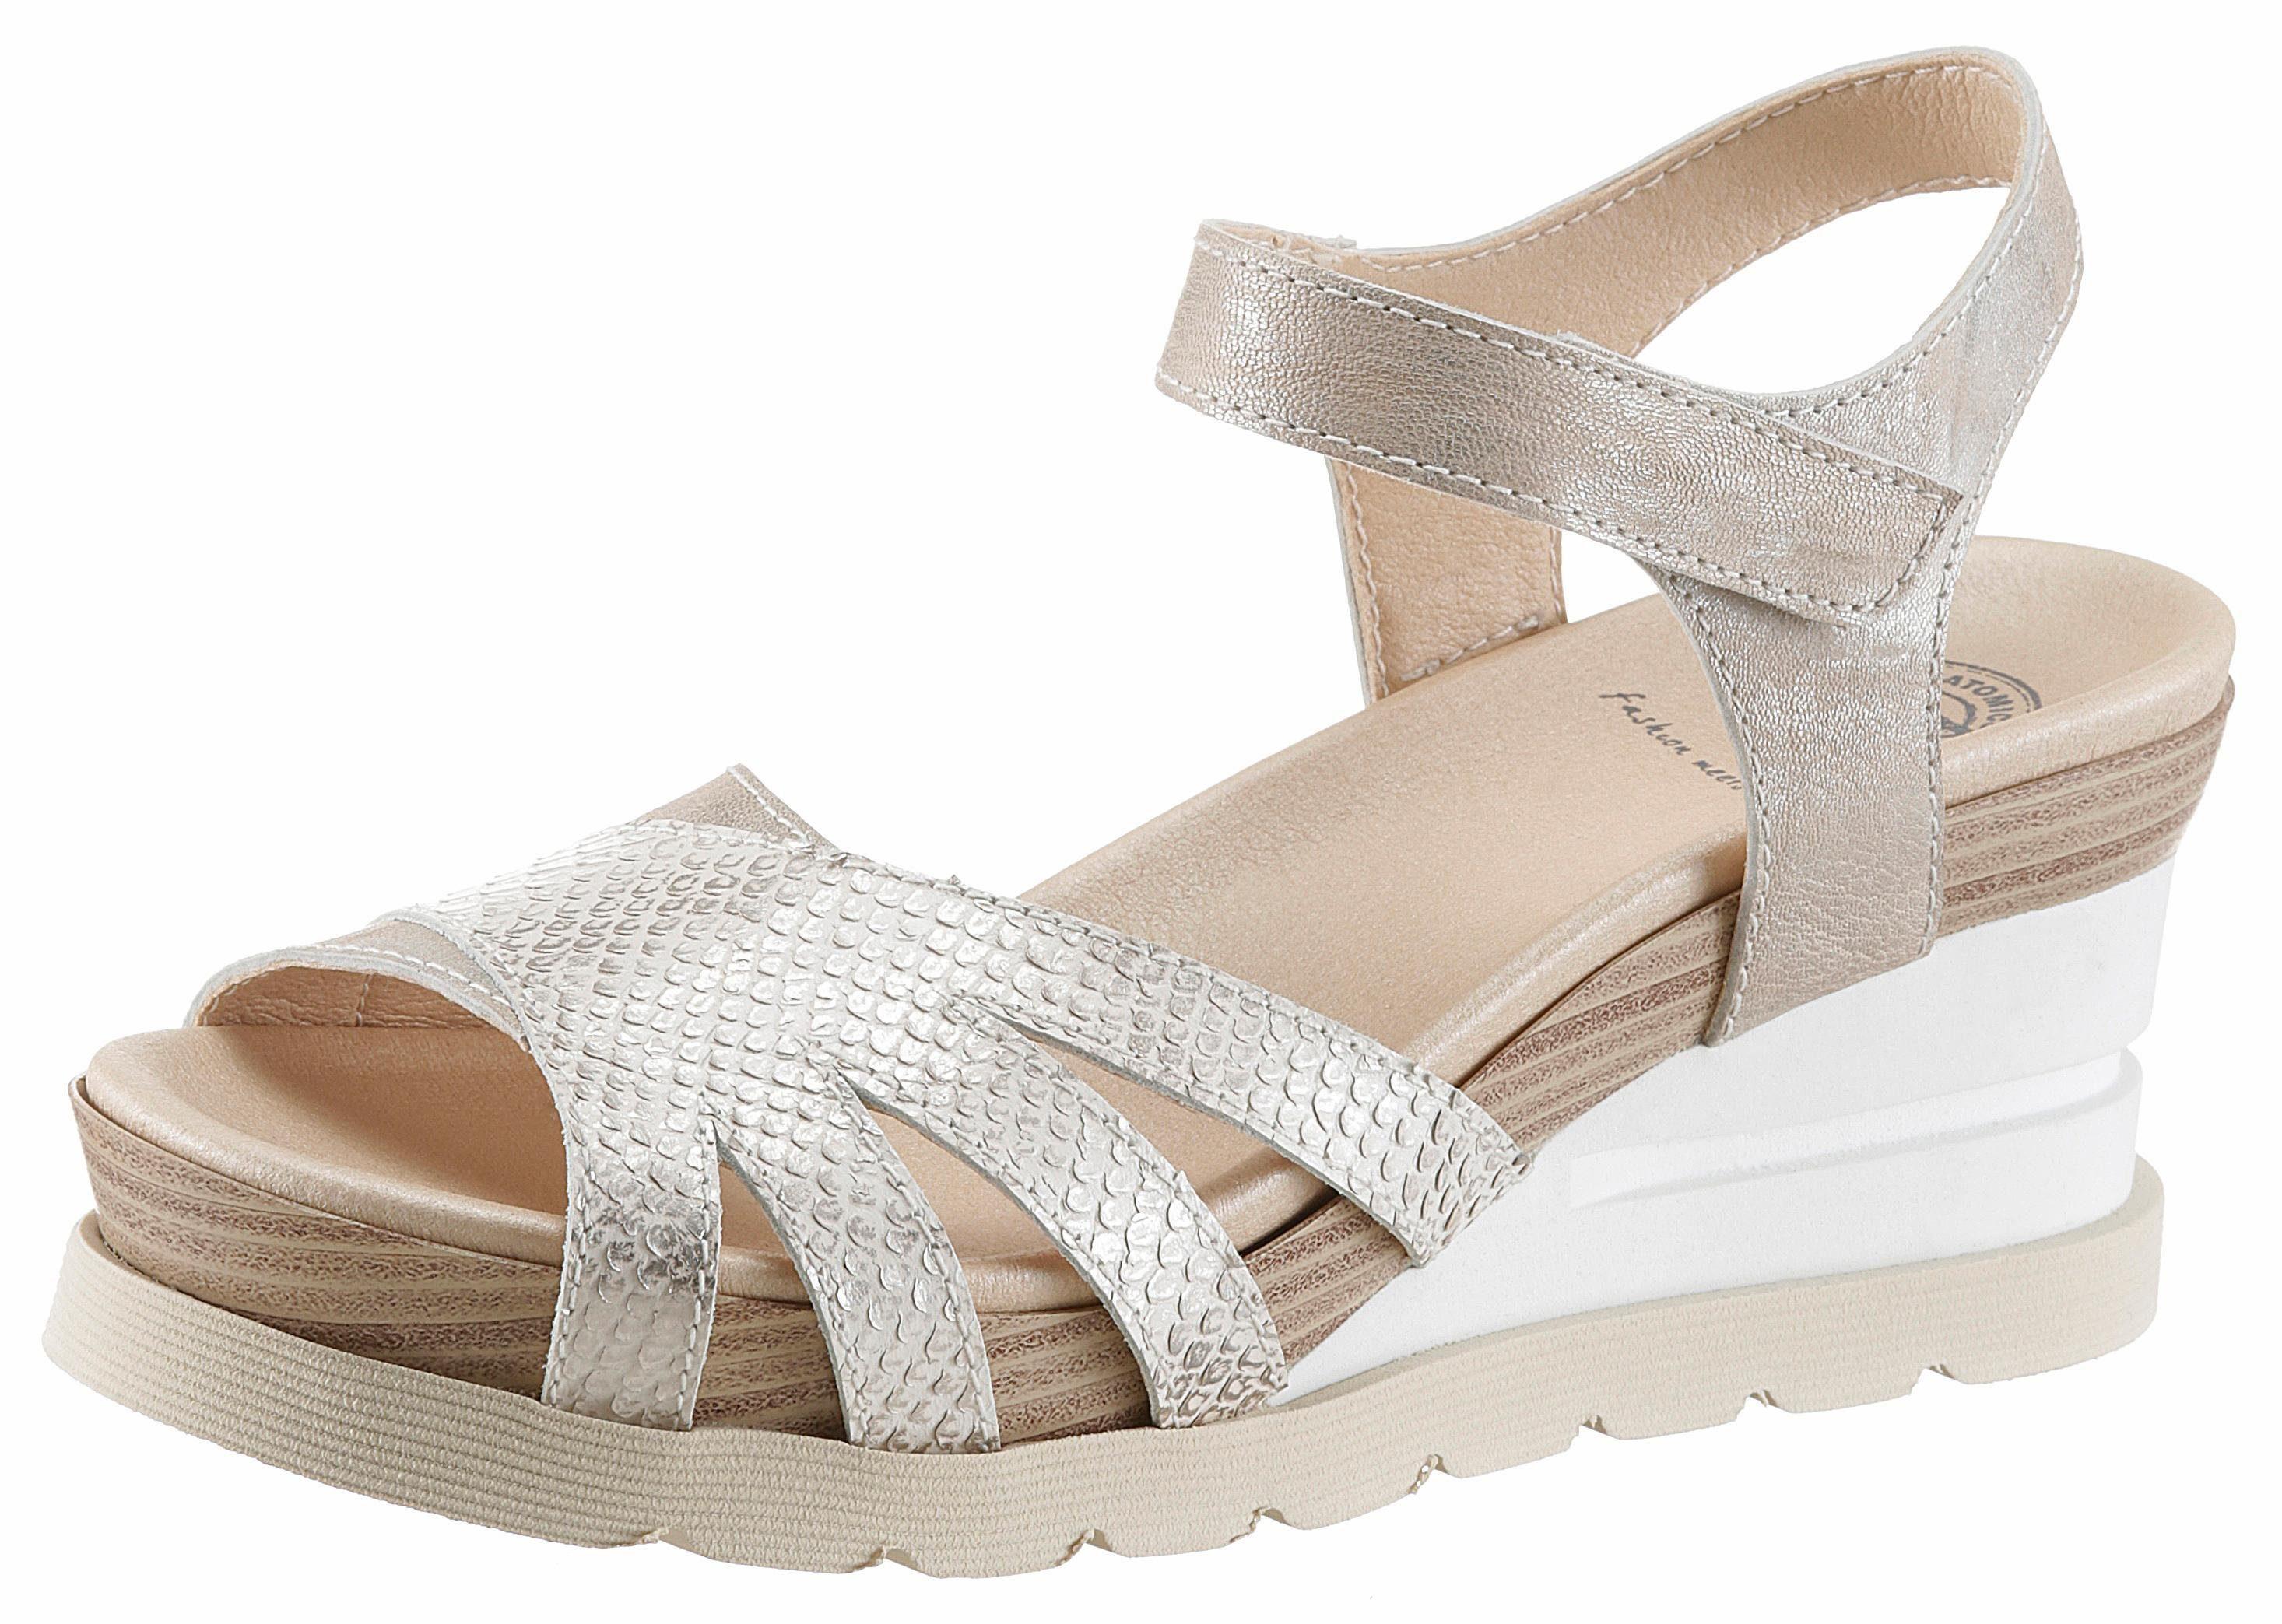 Brako Sandalette, in Metallic-Optik online kaufen  grau